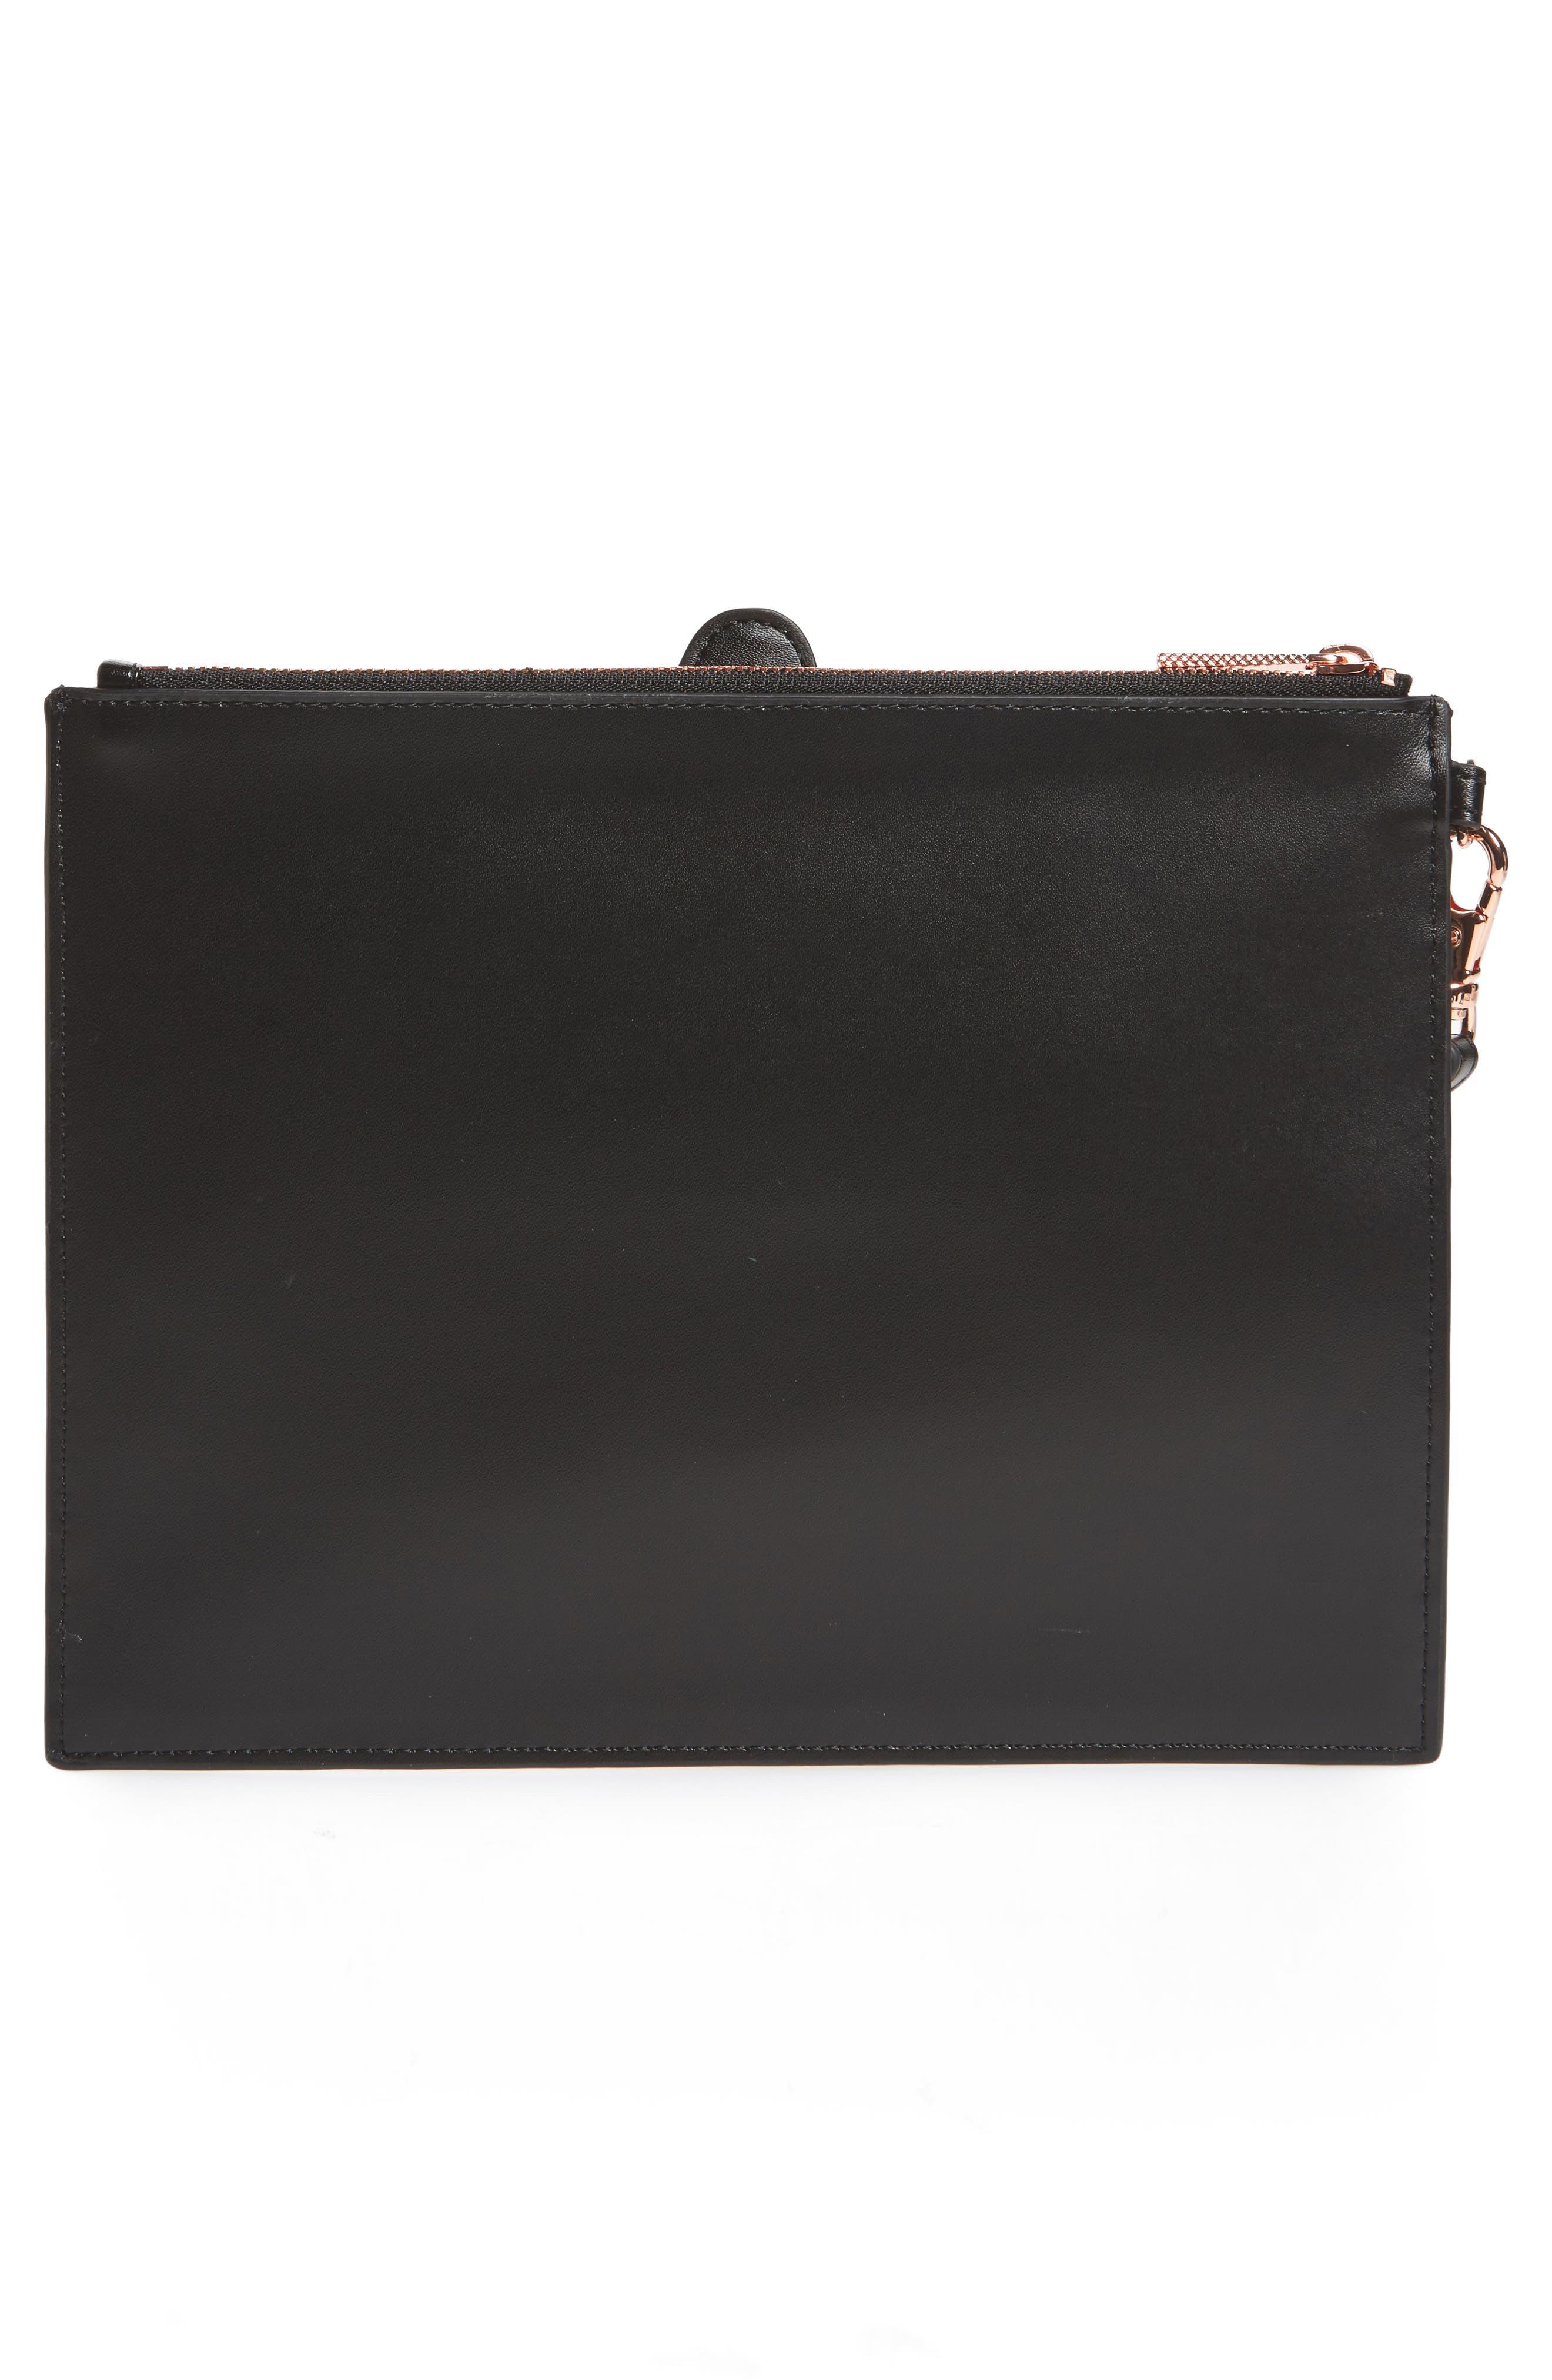 Alternate Image 3  - Ted Baker London Barker Leather Pouch